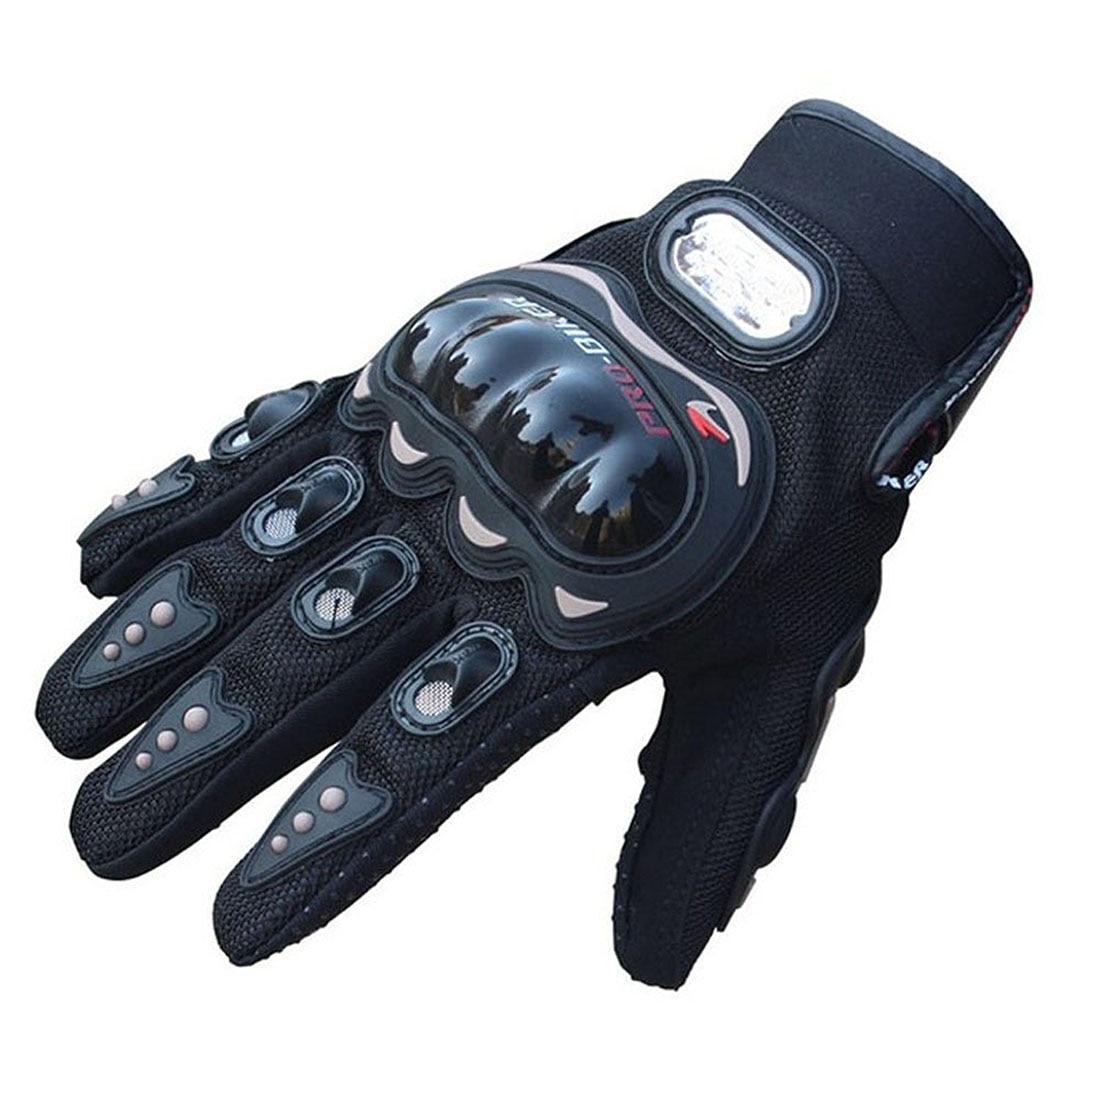 Buy leather bike gloves - Auto Pro Biker 1pair Rock Black Short Sports Leather Motorcycle Motorbike Summer Gloves China